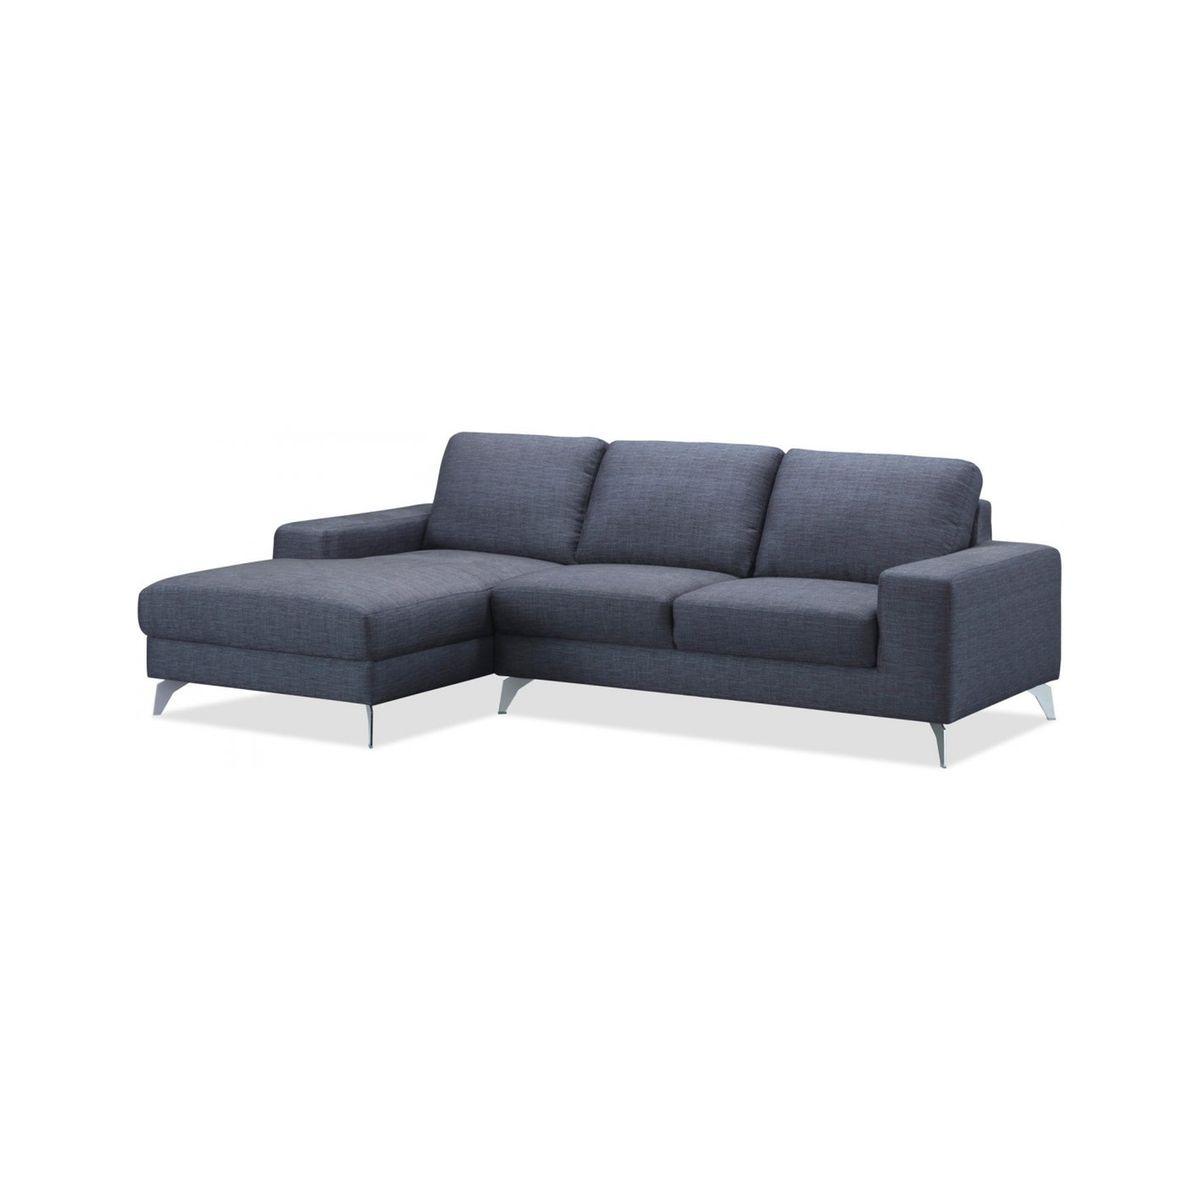 Canapé d'angle gauche WALK CHABLIS tissu